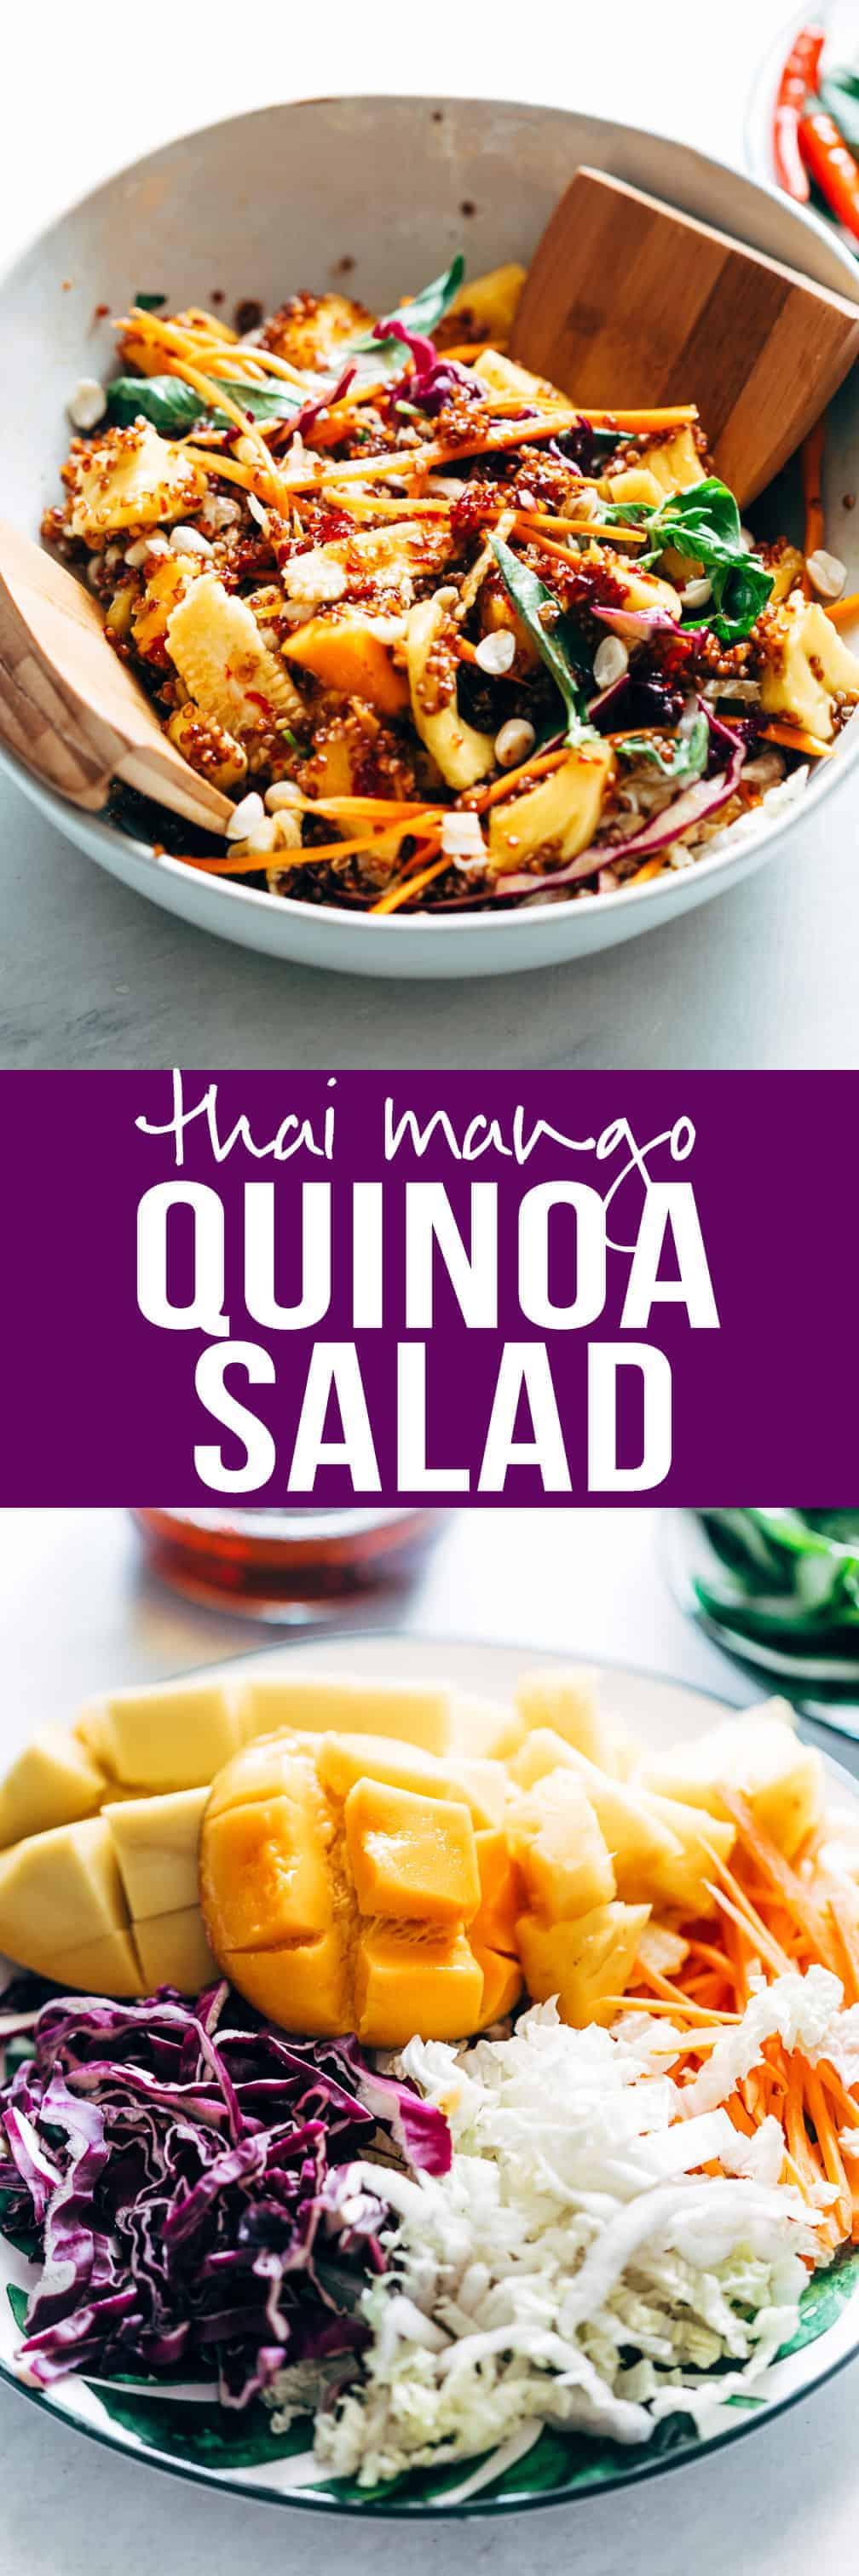 Thai Peanut Mango Quinoa Salad | Sweet Spicy Thai Sambal Dressing | Make Ahead Salad Recipe Ideas | Cold Healthy Quinoa Salad | Potlucks, Picnic and Barbecue Recipes | Asian Salad | Gluten Free | Vegan | Not Peanut Dressing